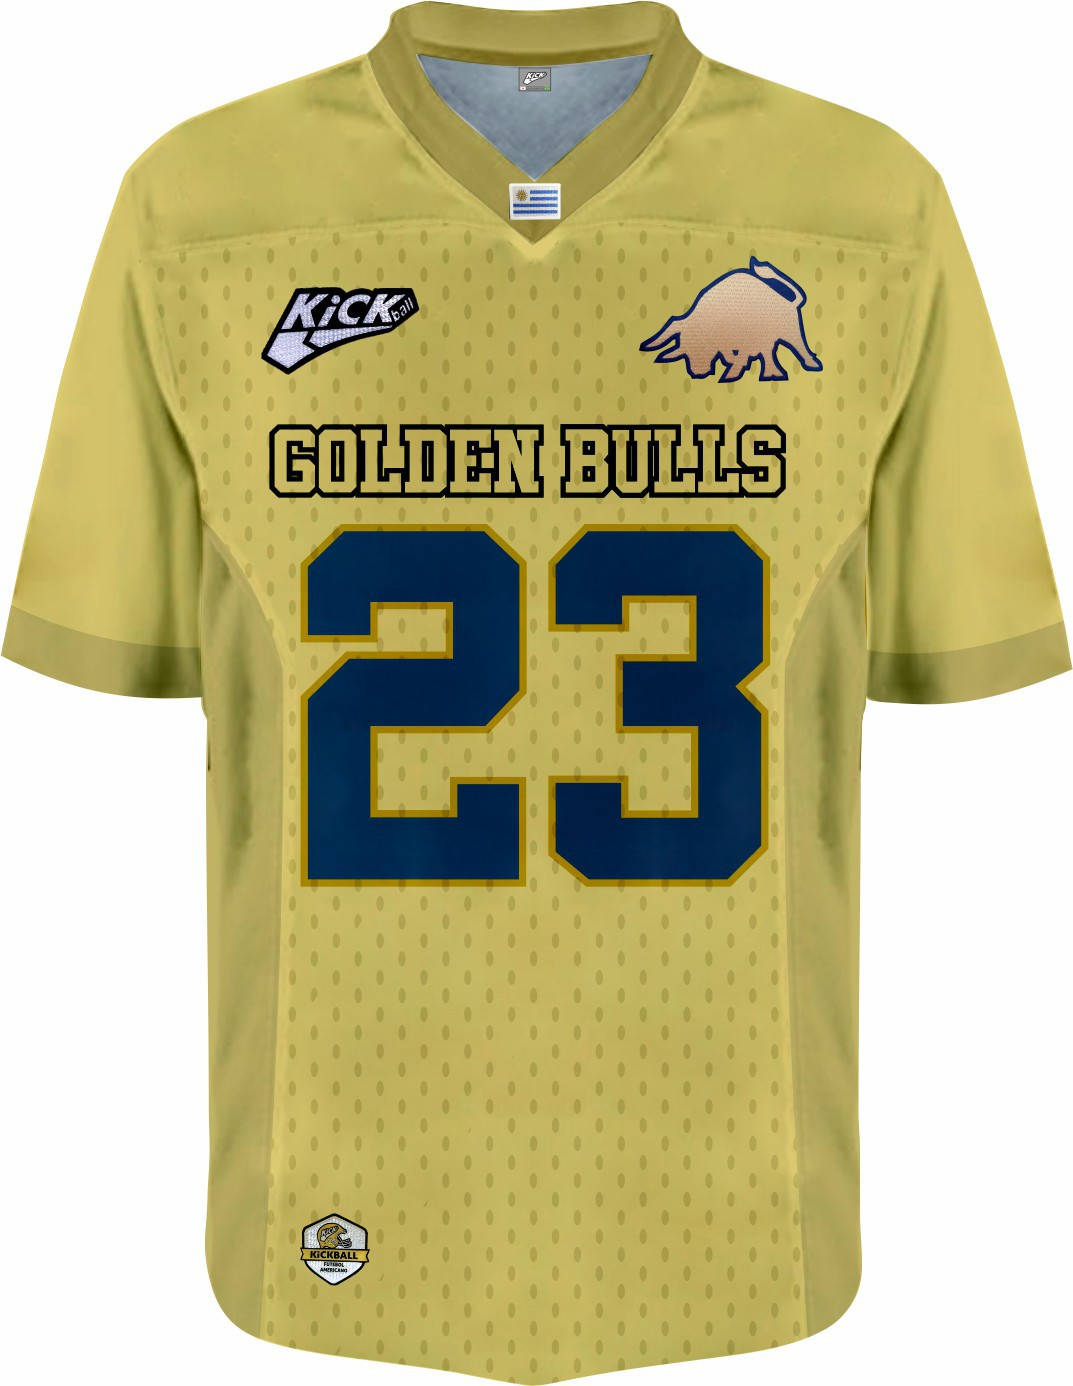 Camisa Of. Golden Bulls Jersey Plus Masc. Mod2